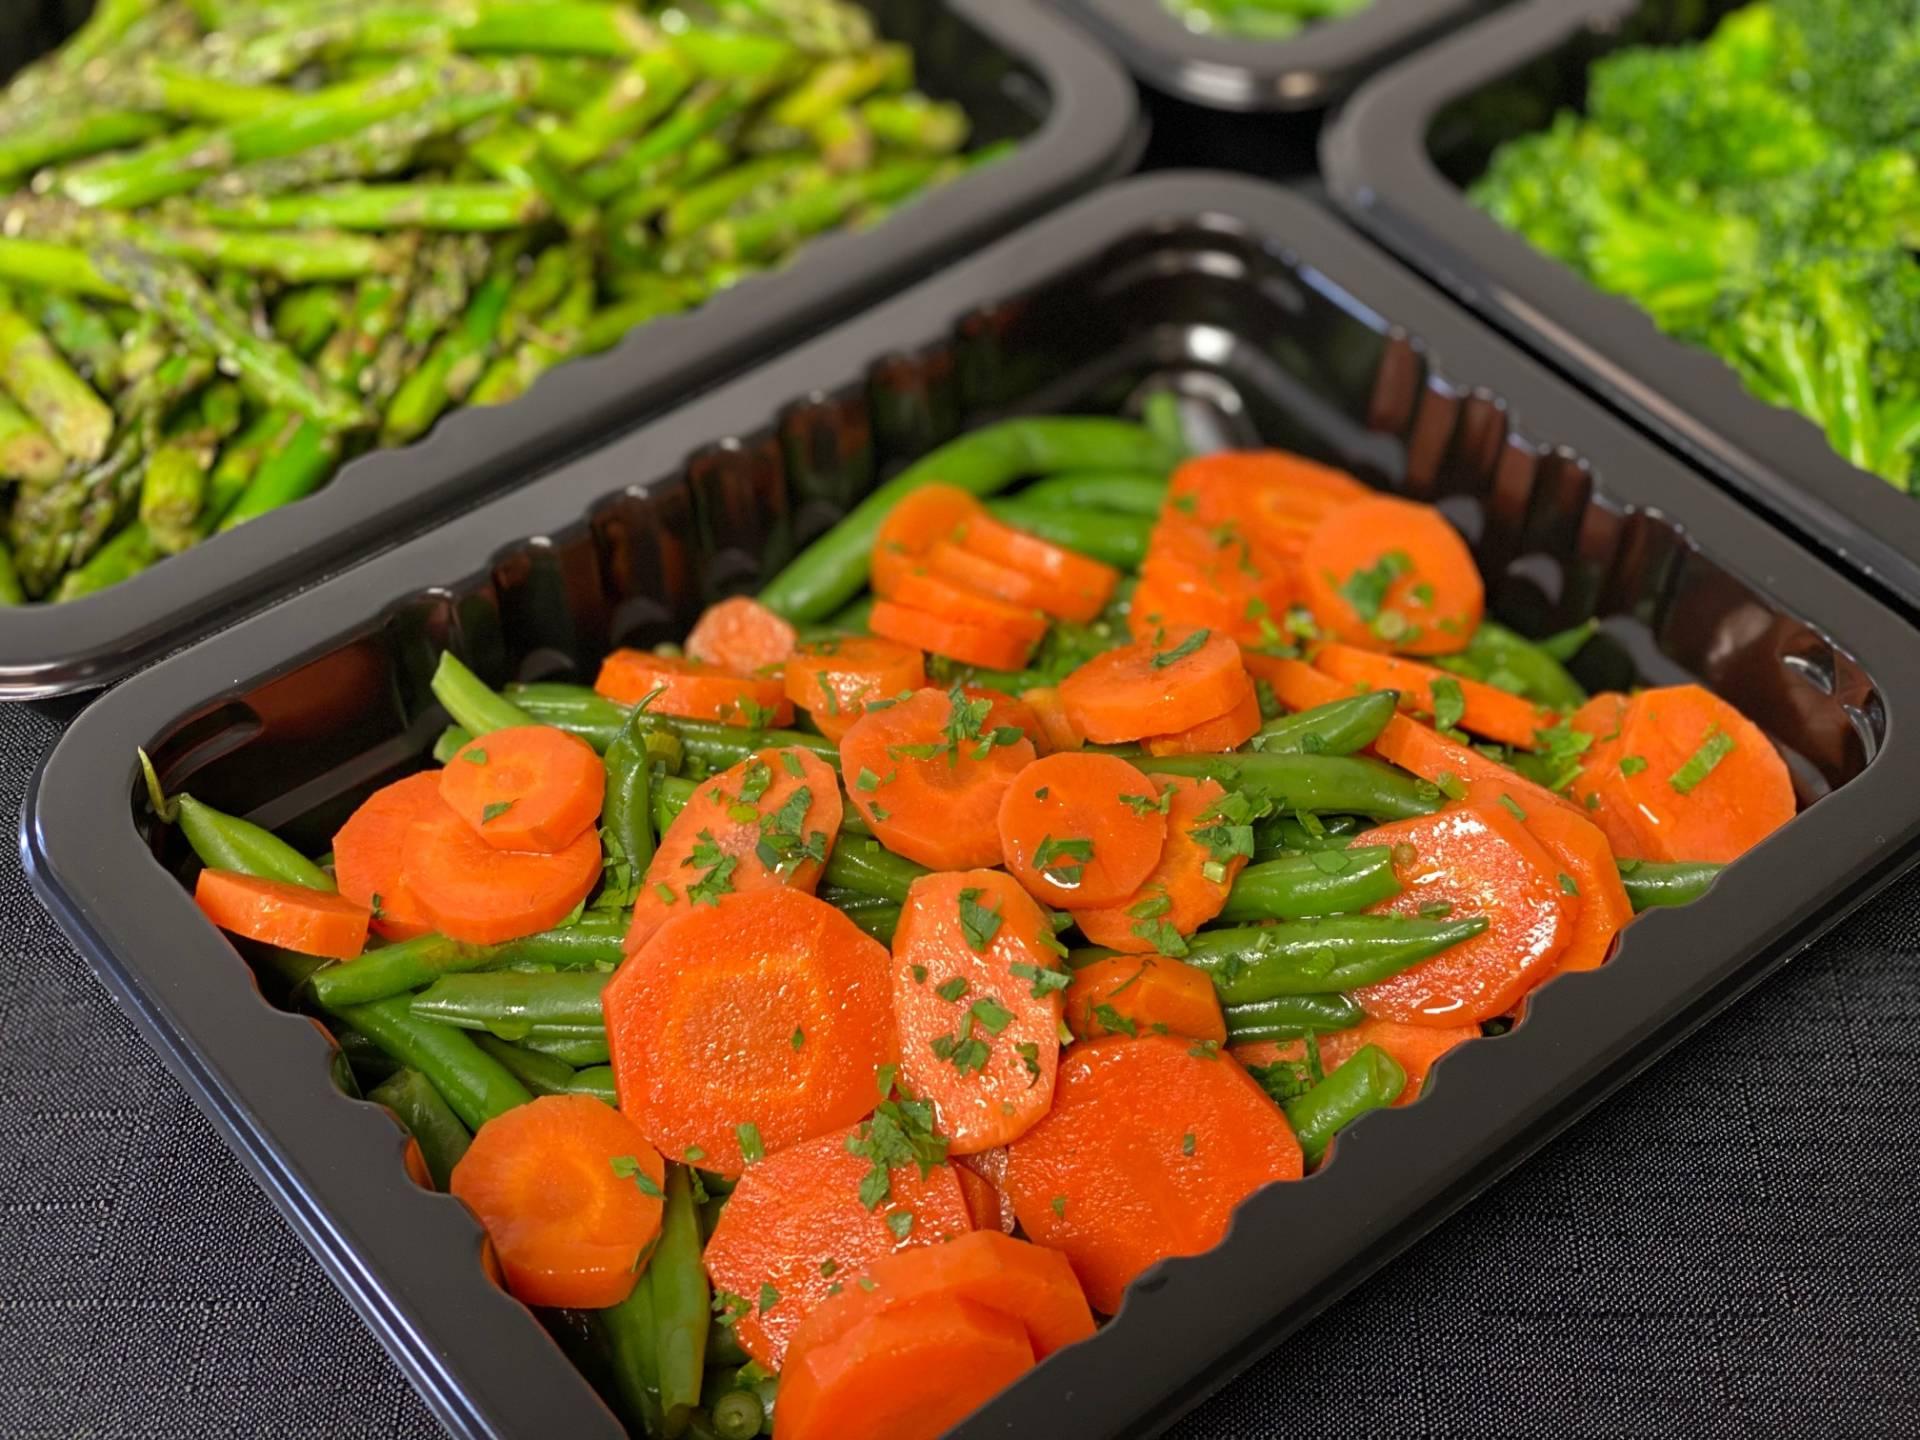 Xtra Carrots & Green Beans